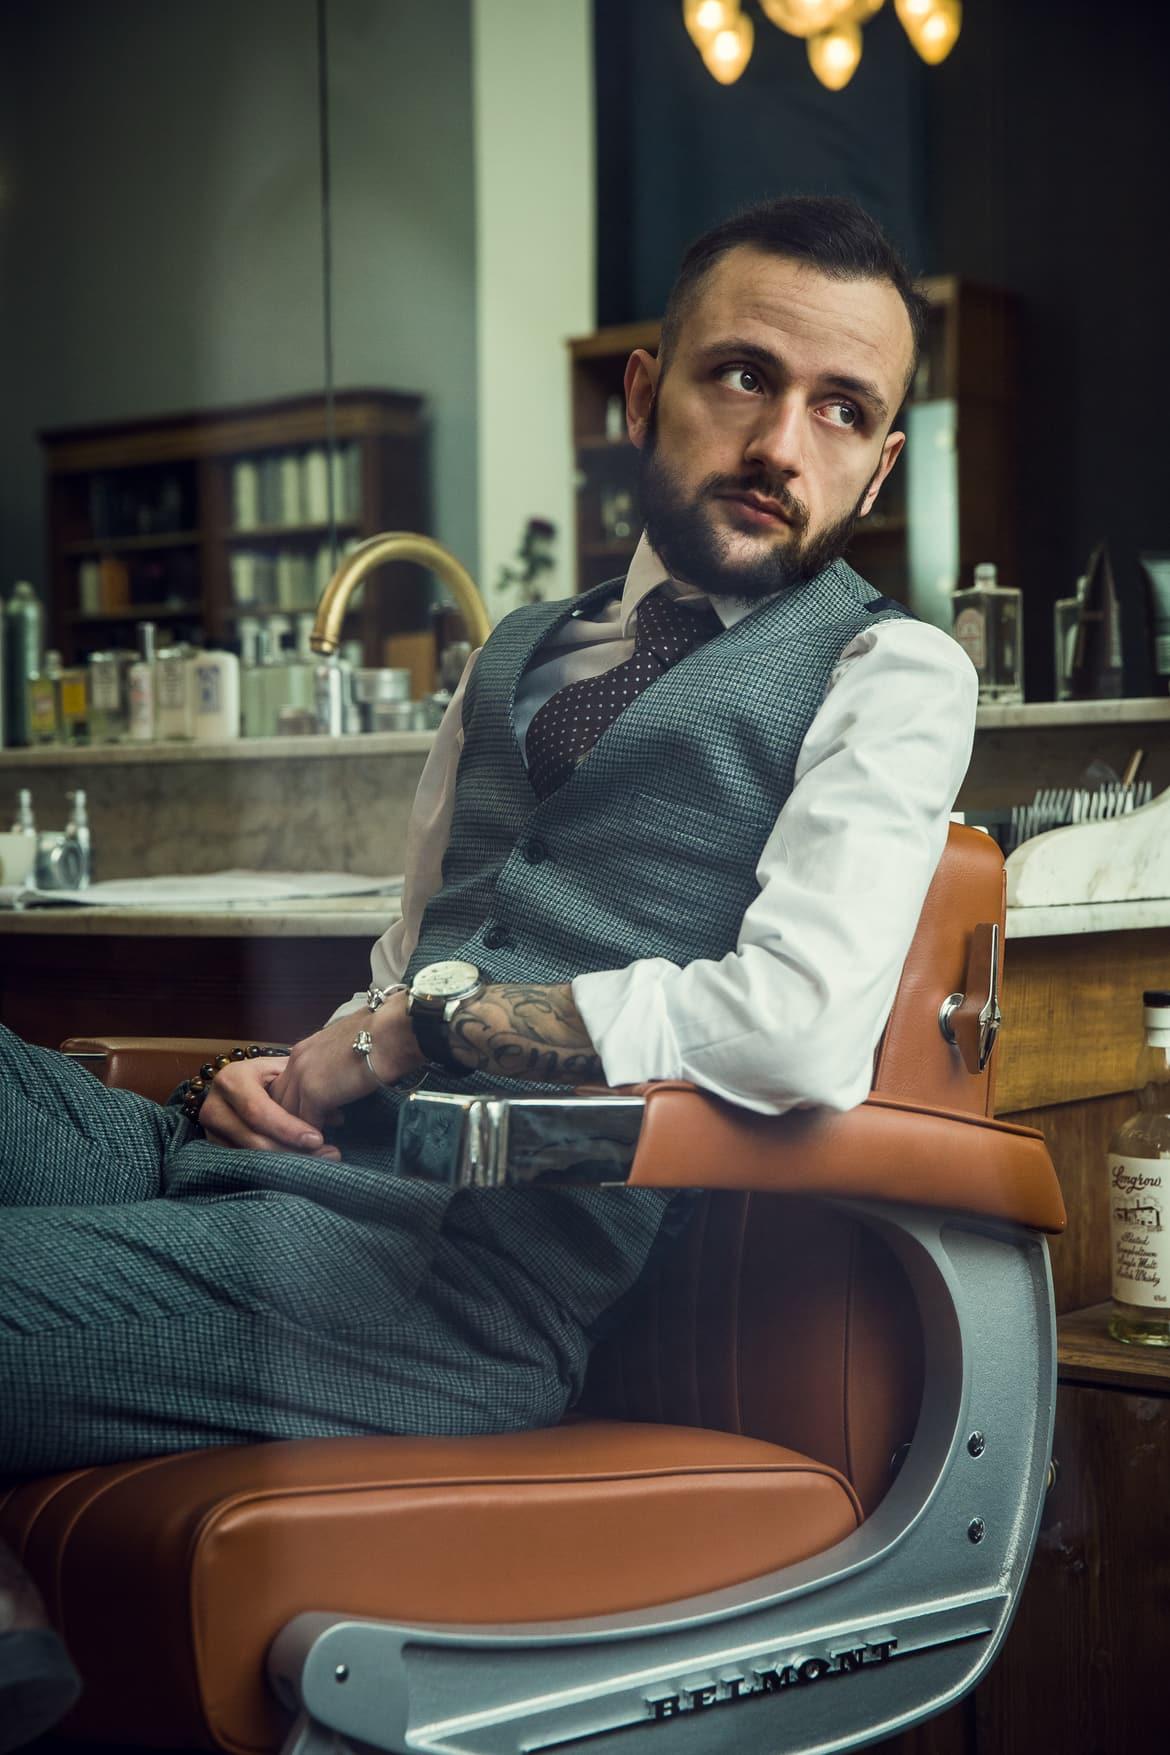 freitag_barber_01.jpg